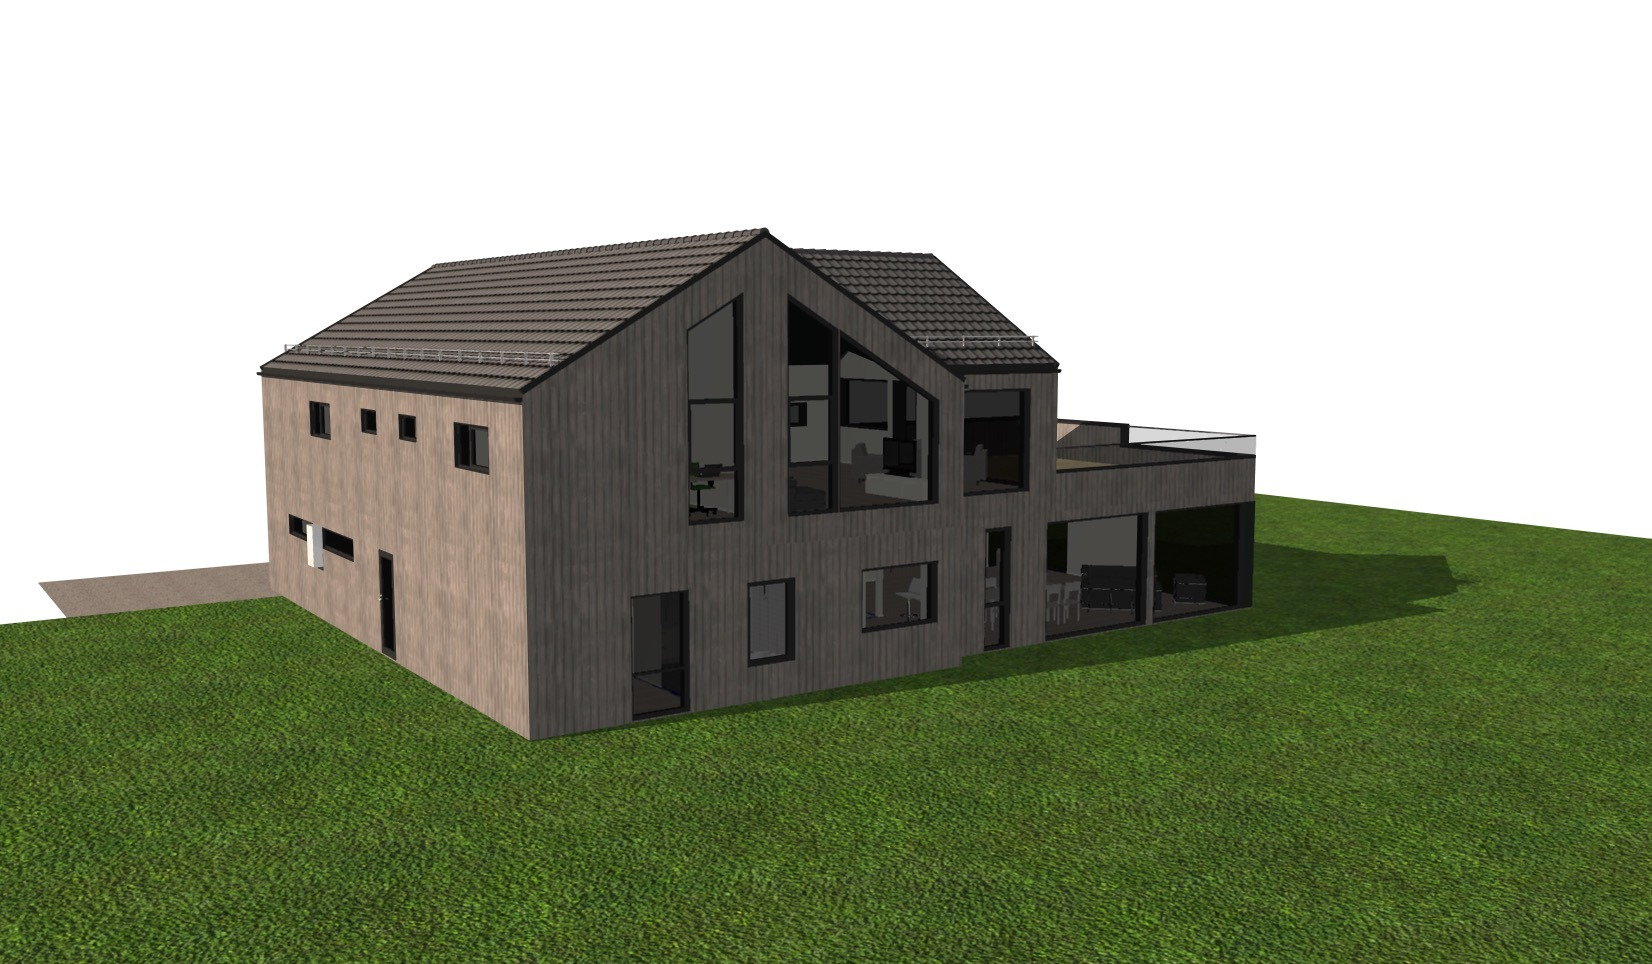 Homrabron fra Rasmussen Bygg - Fasade 4